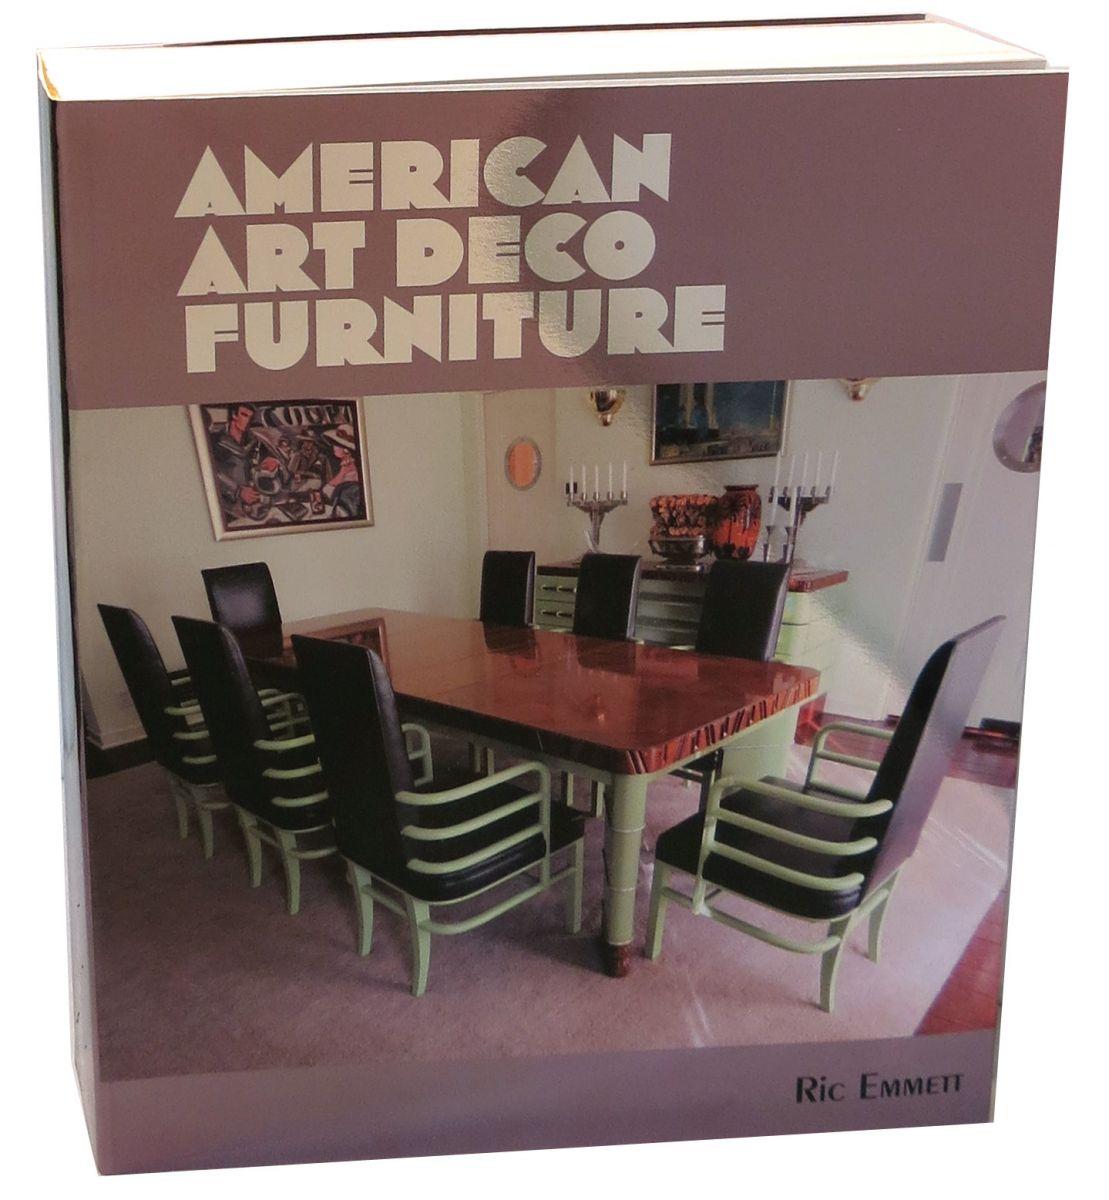 American Art Deco Furniture By Ric Emmett Ltd Edition Book